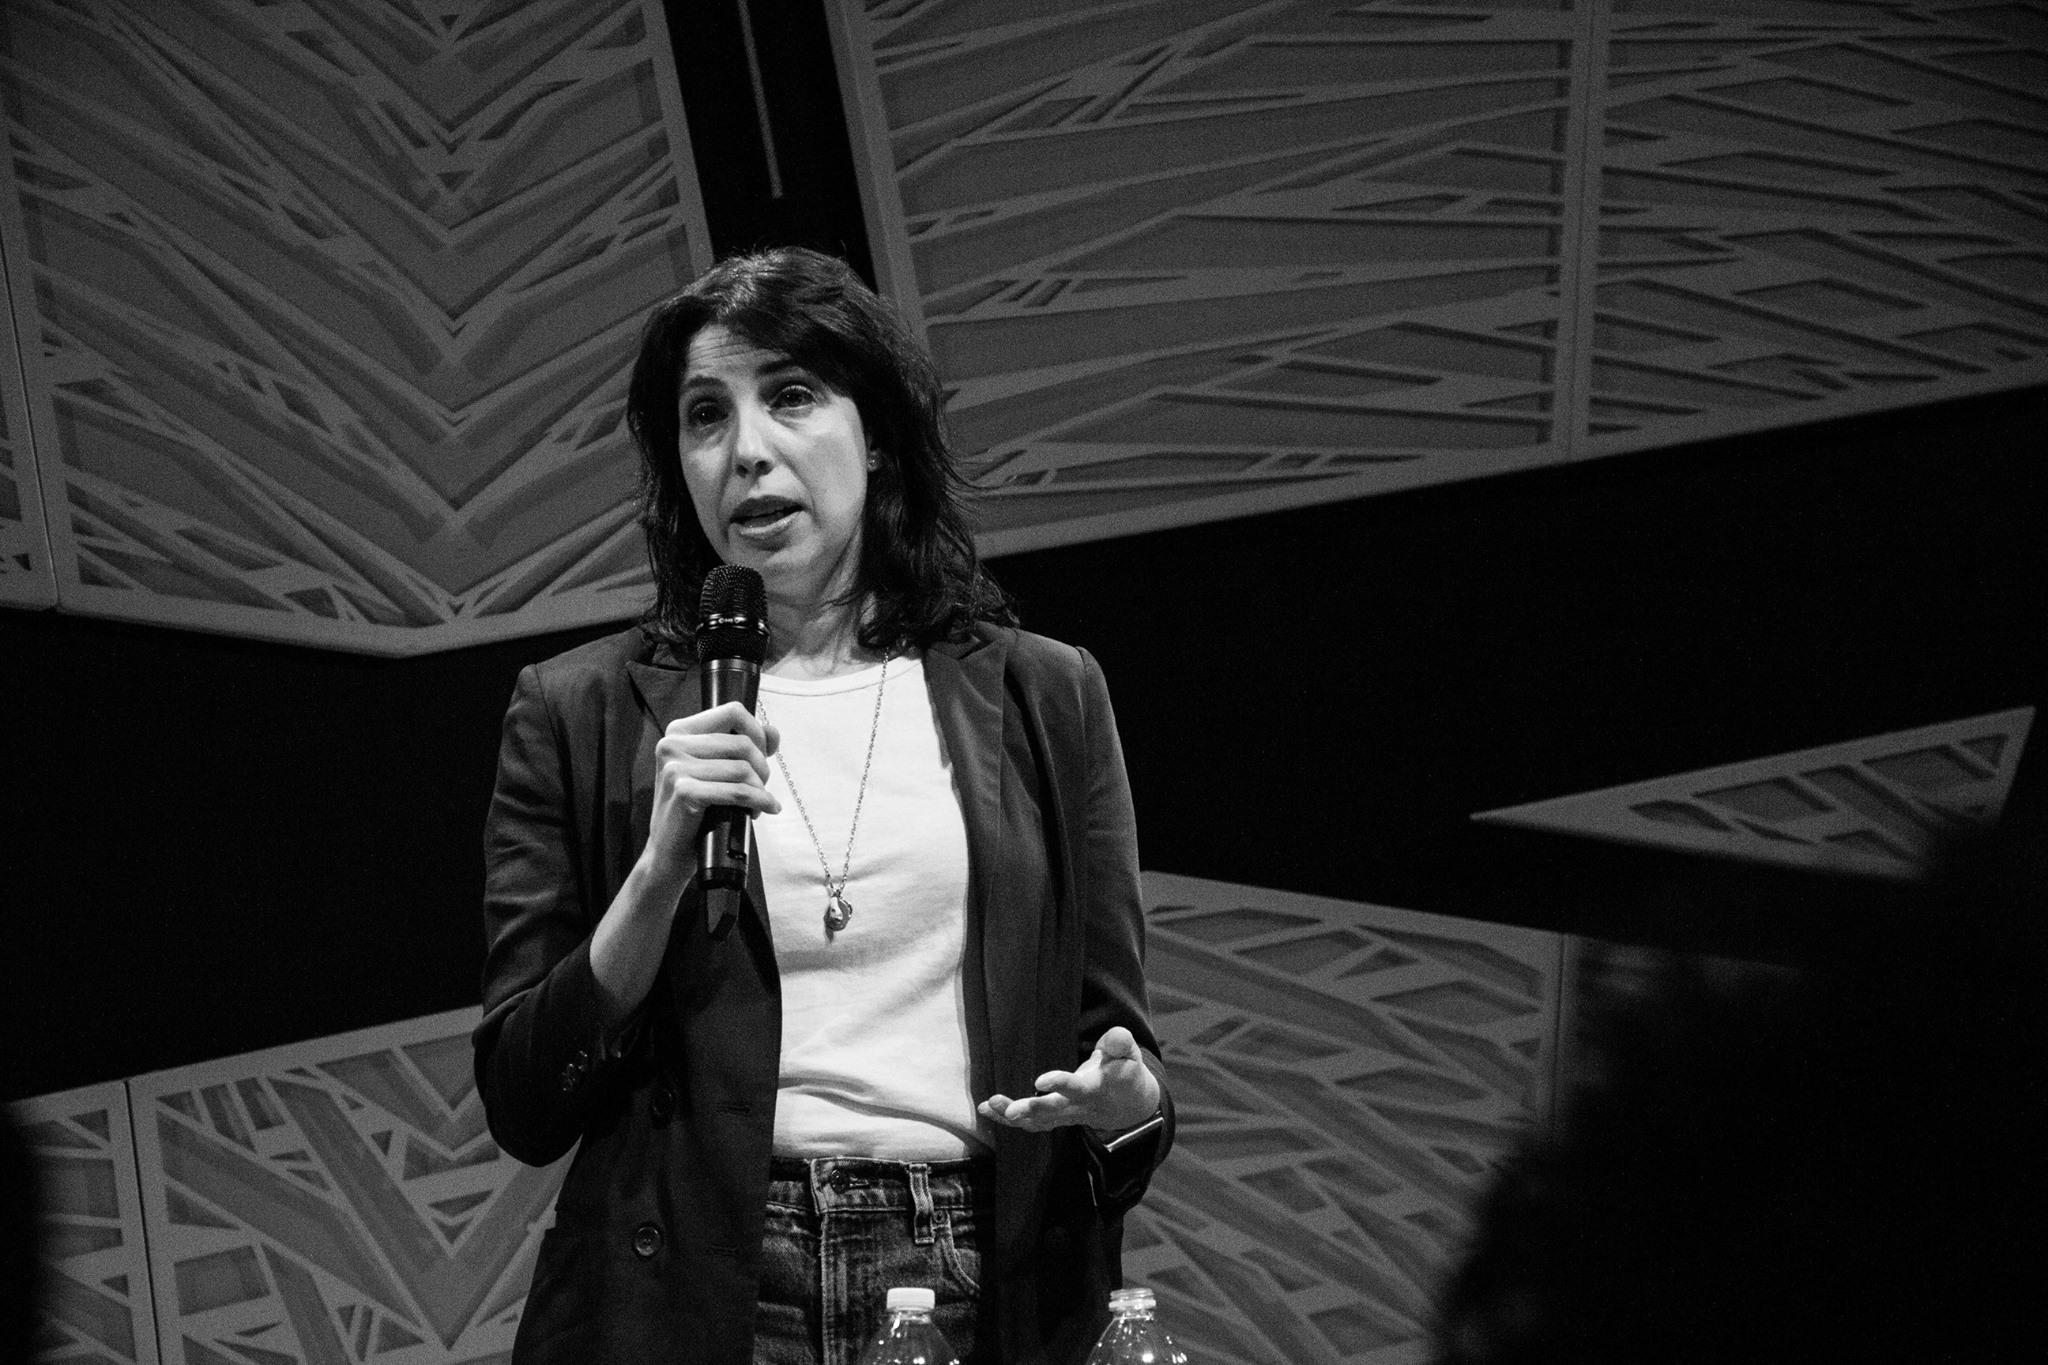 Lauren Katzman